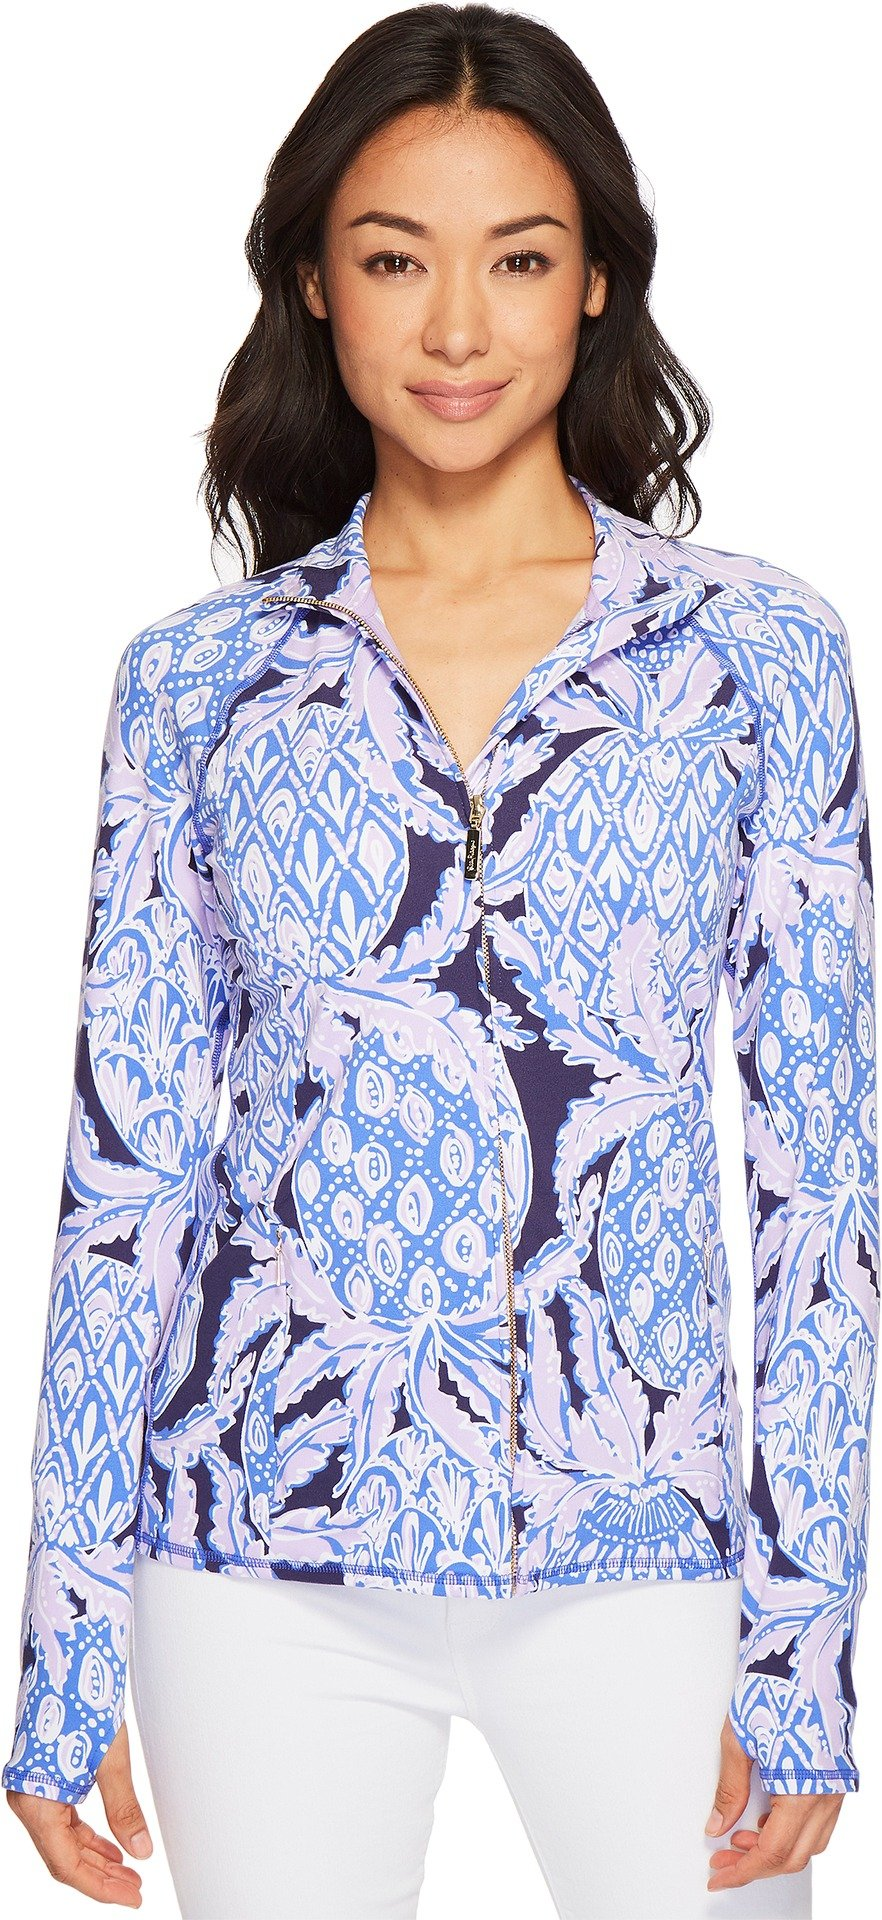 Lilly Pulitzer Women's Luxletic Serena Jacket Beckon Blue Coco Safari X-Large